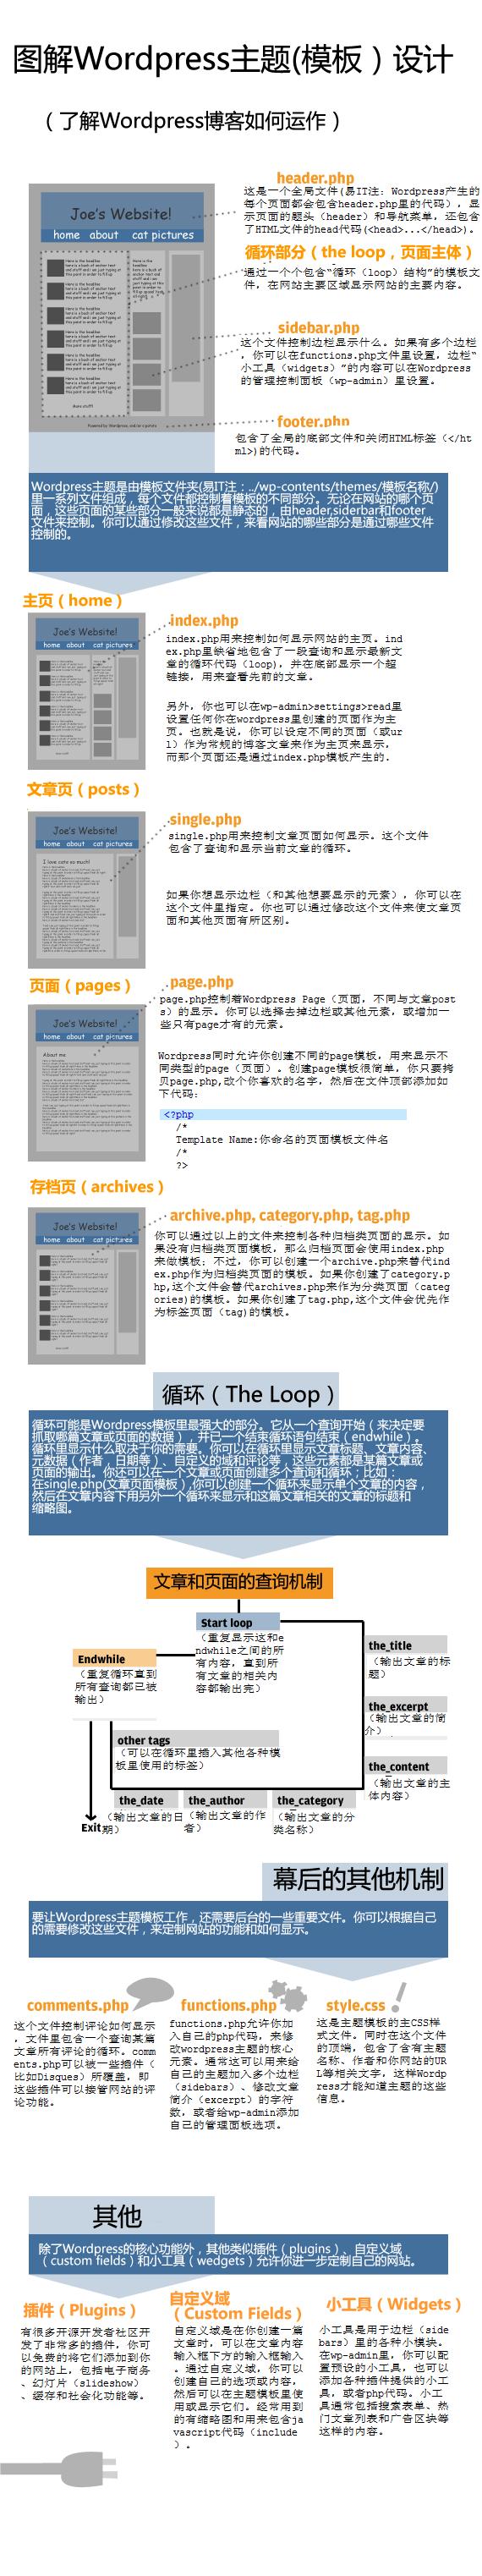 wordpress二次开发:图解WordPress模板架构